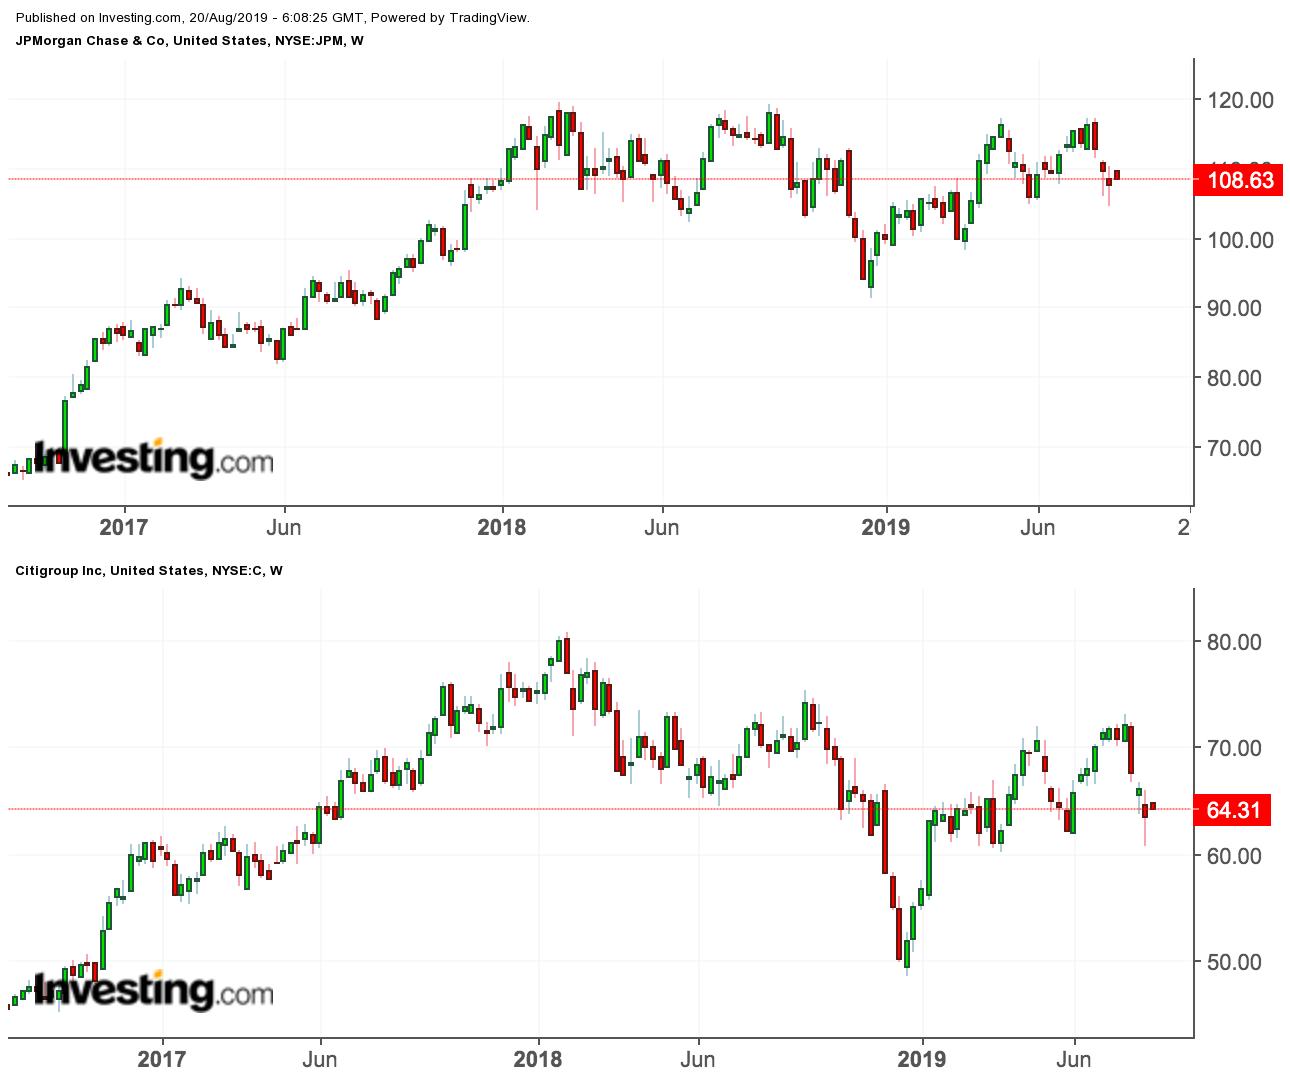 JPM/City Price Chart